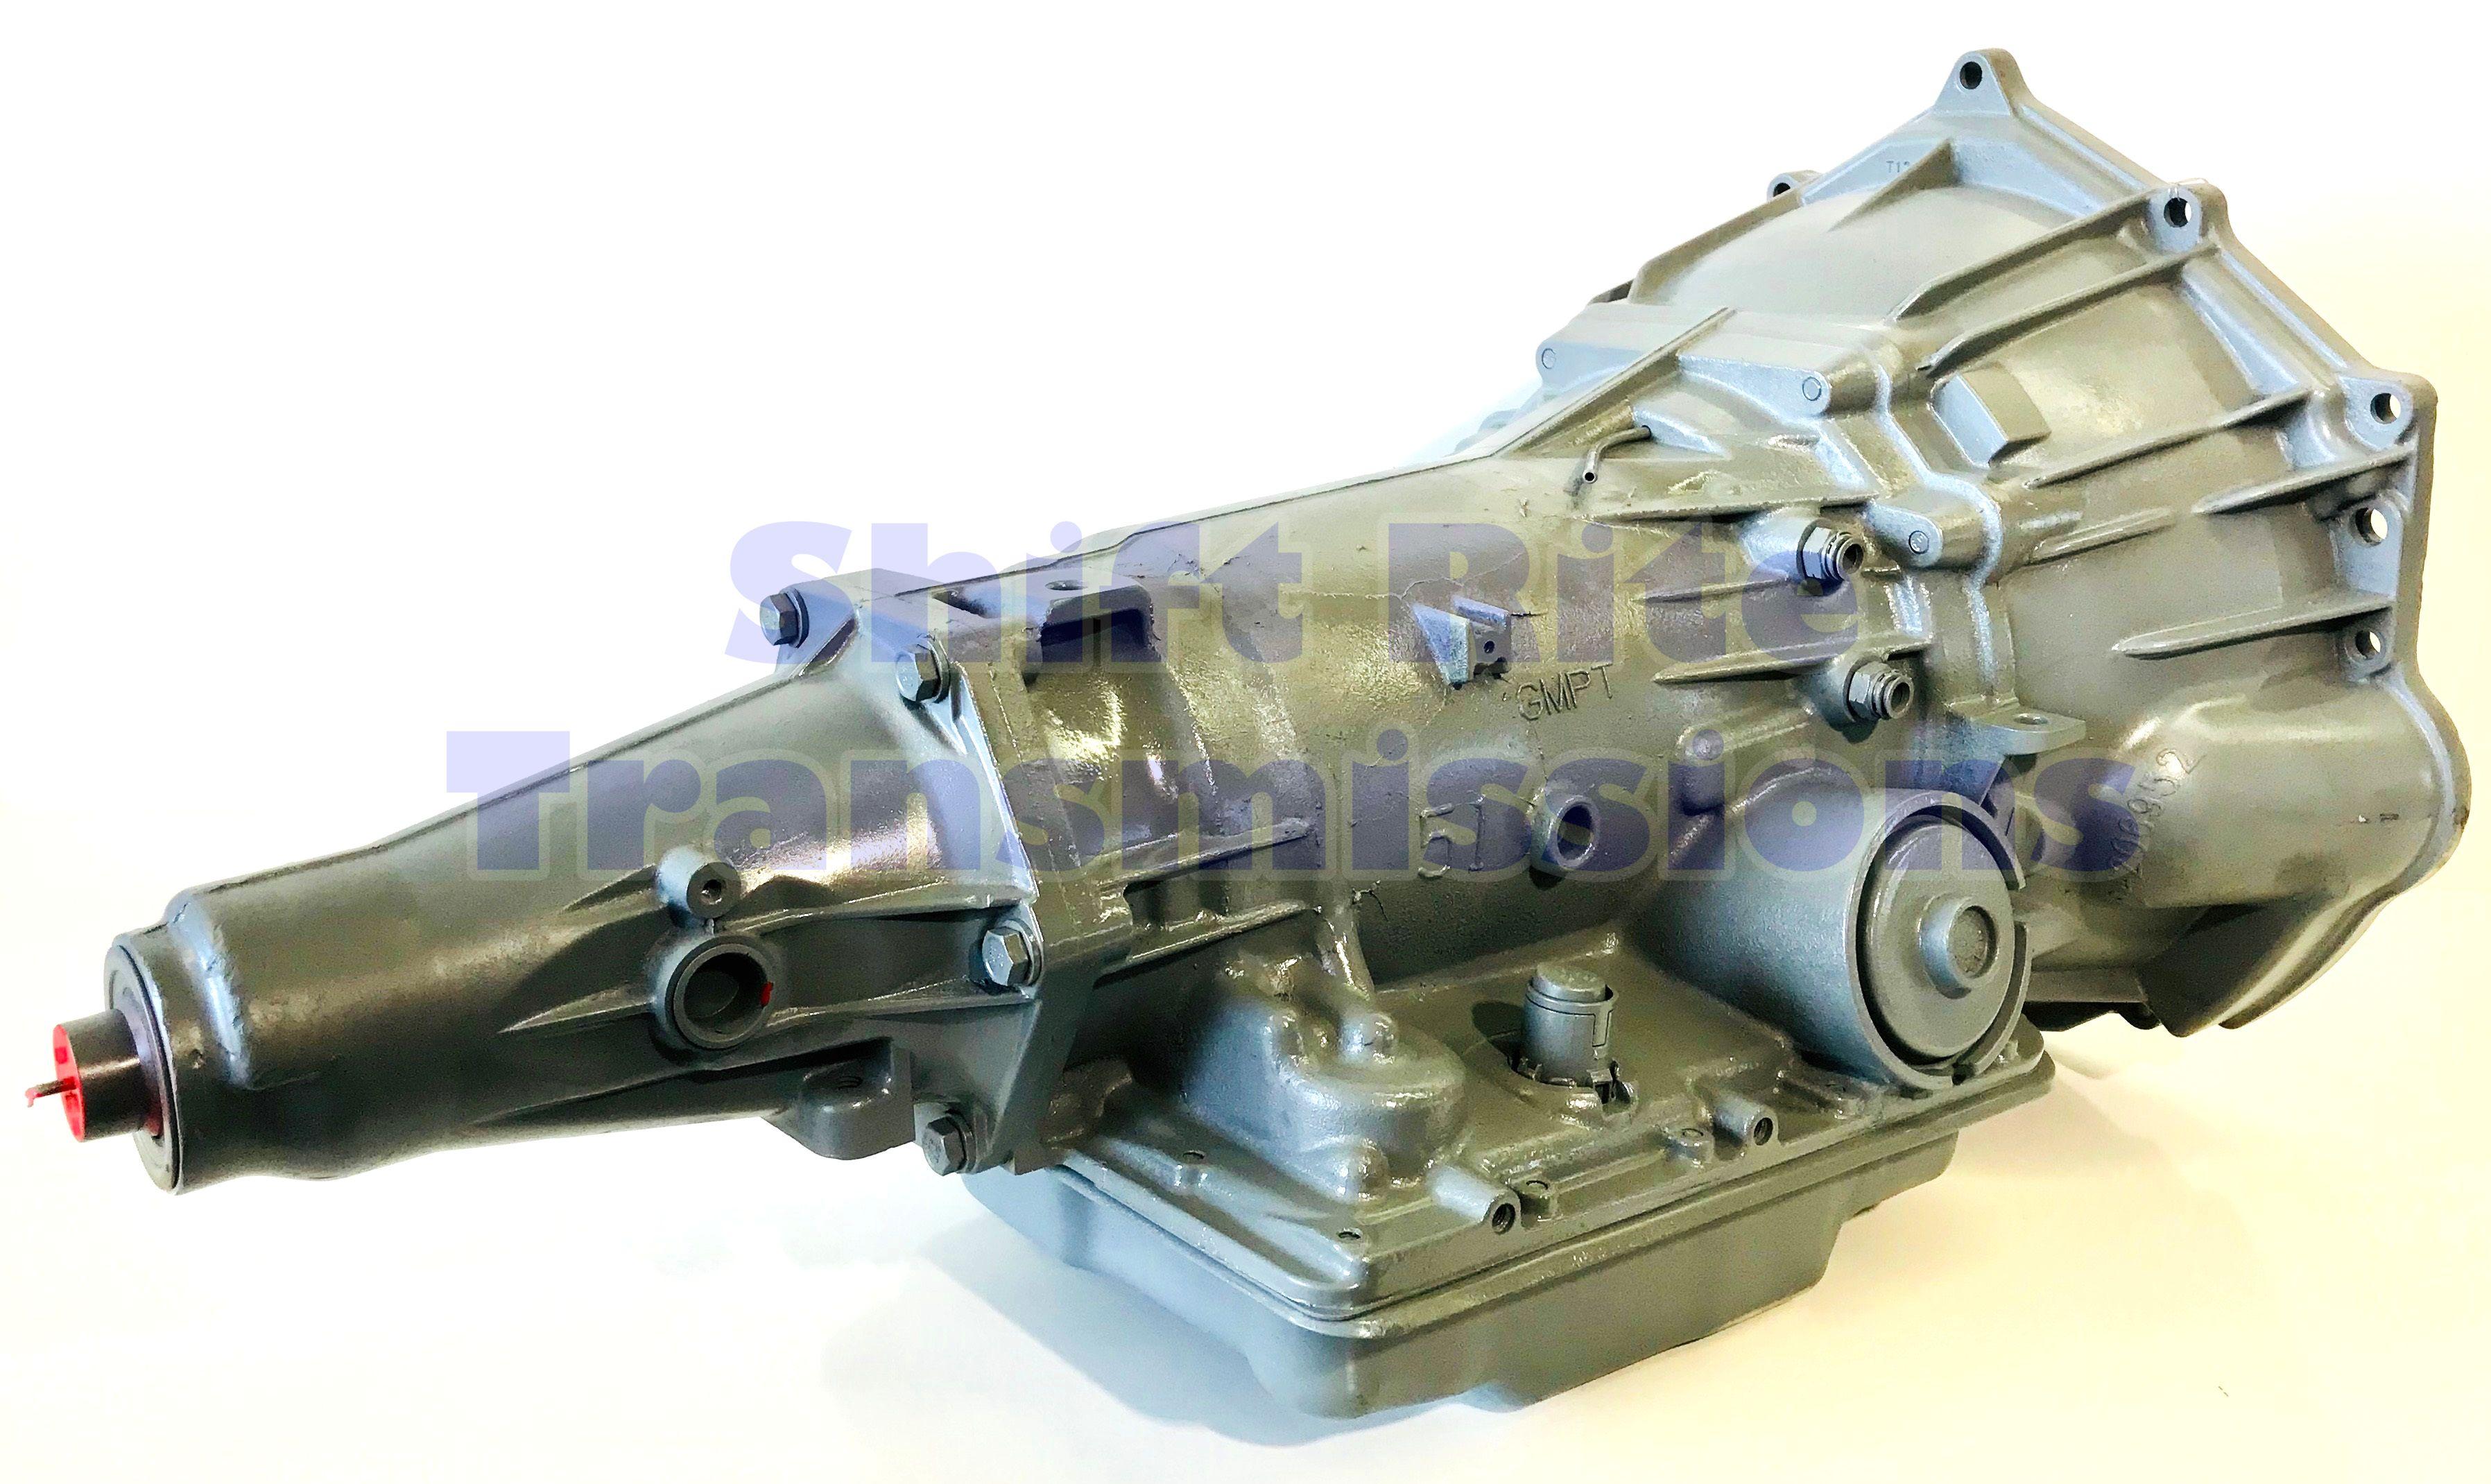 2001 GMC YUKON AUTO TRANSMISSION 5.3L 2WD 4L60E